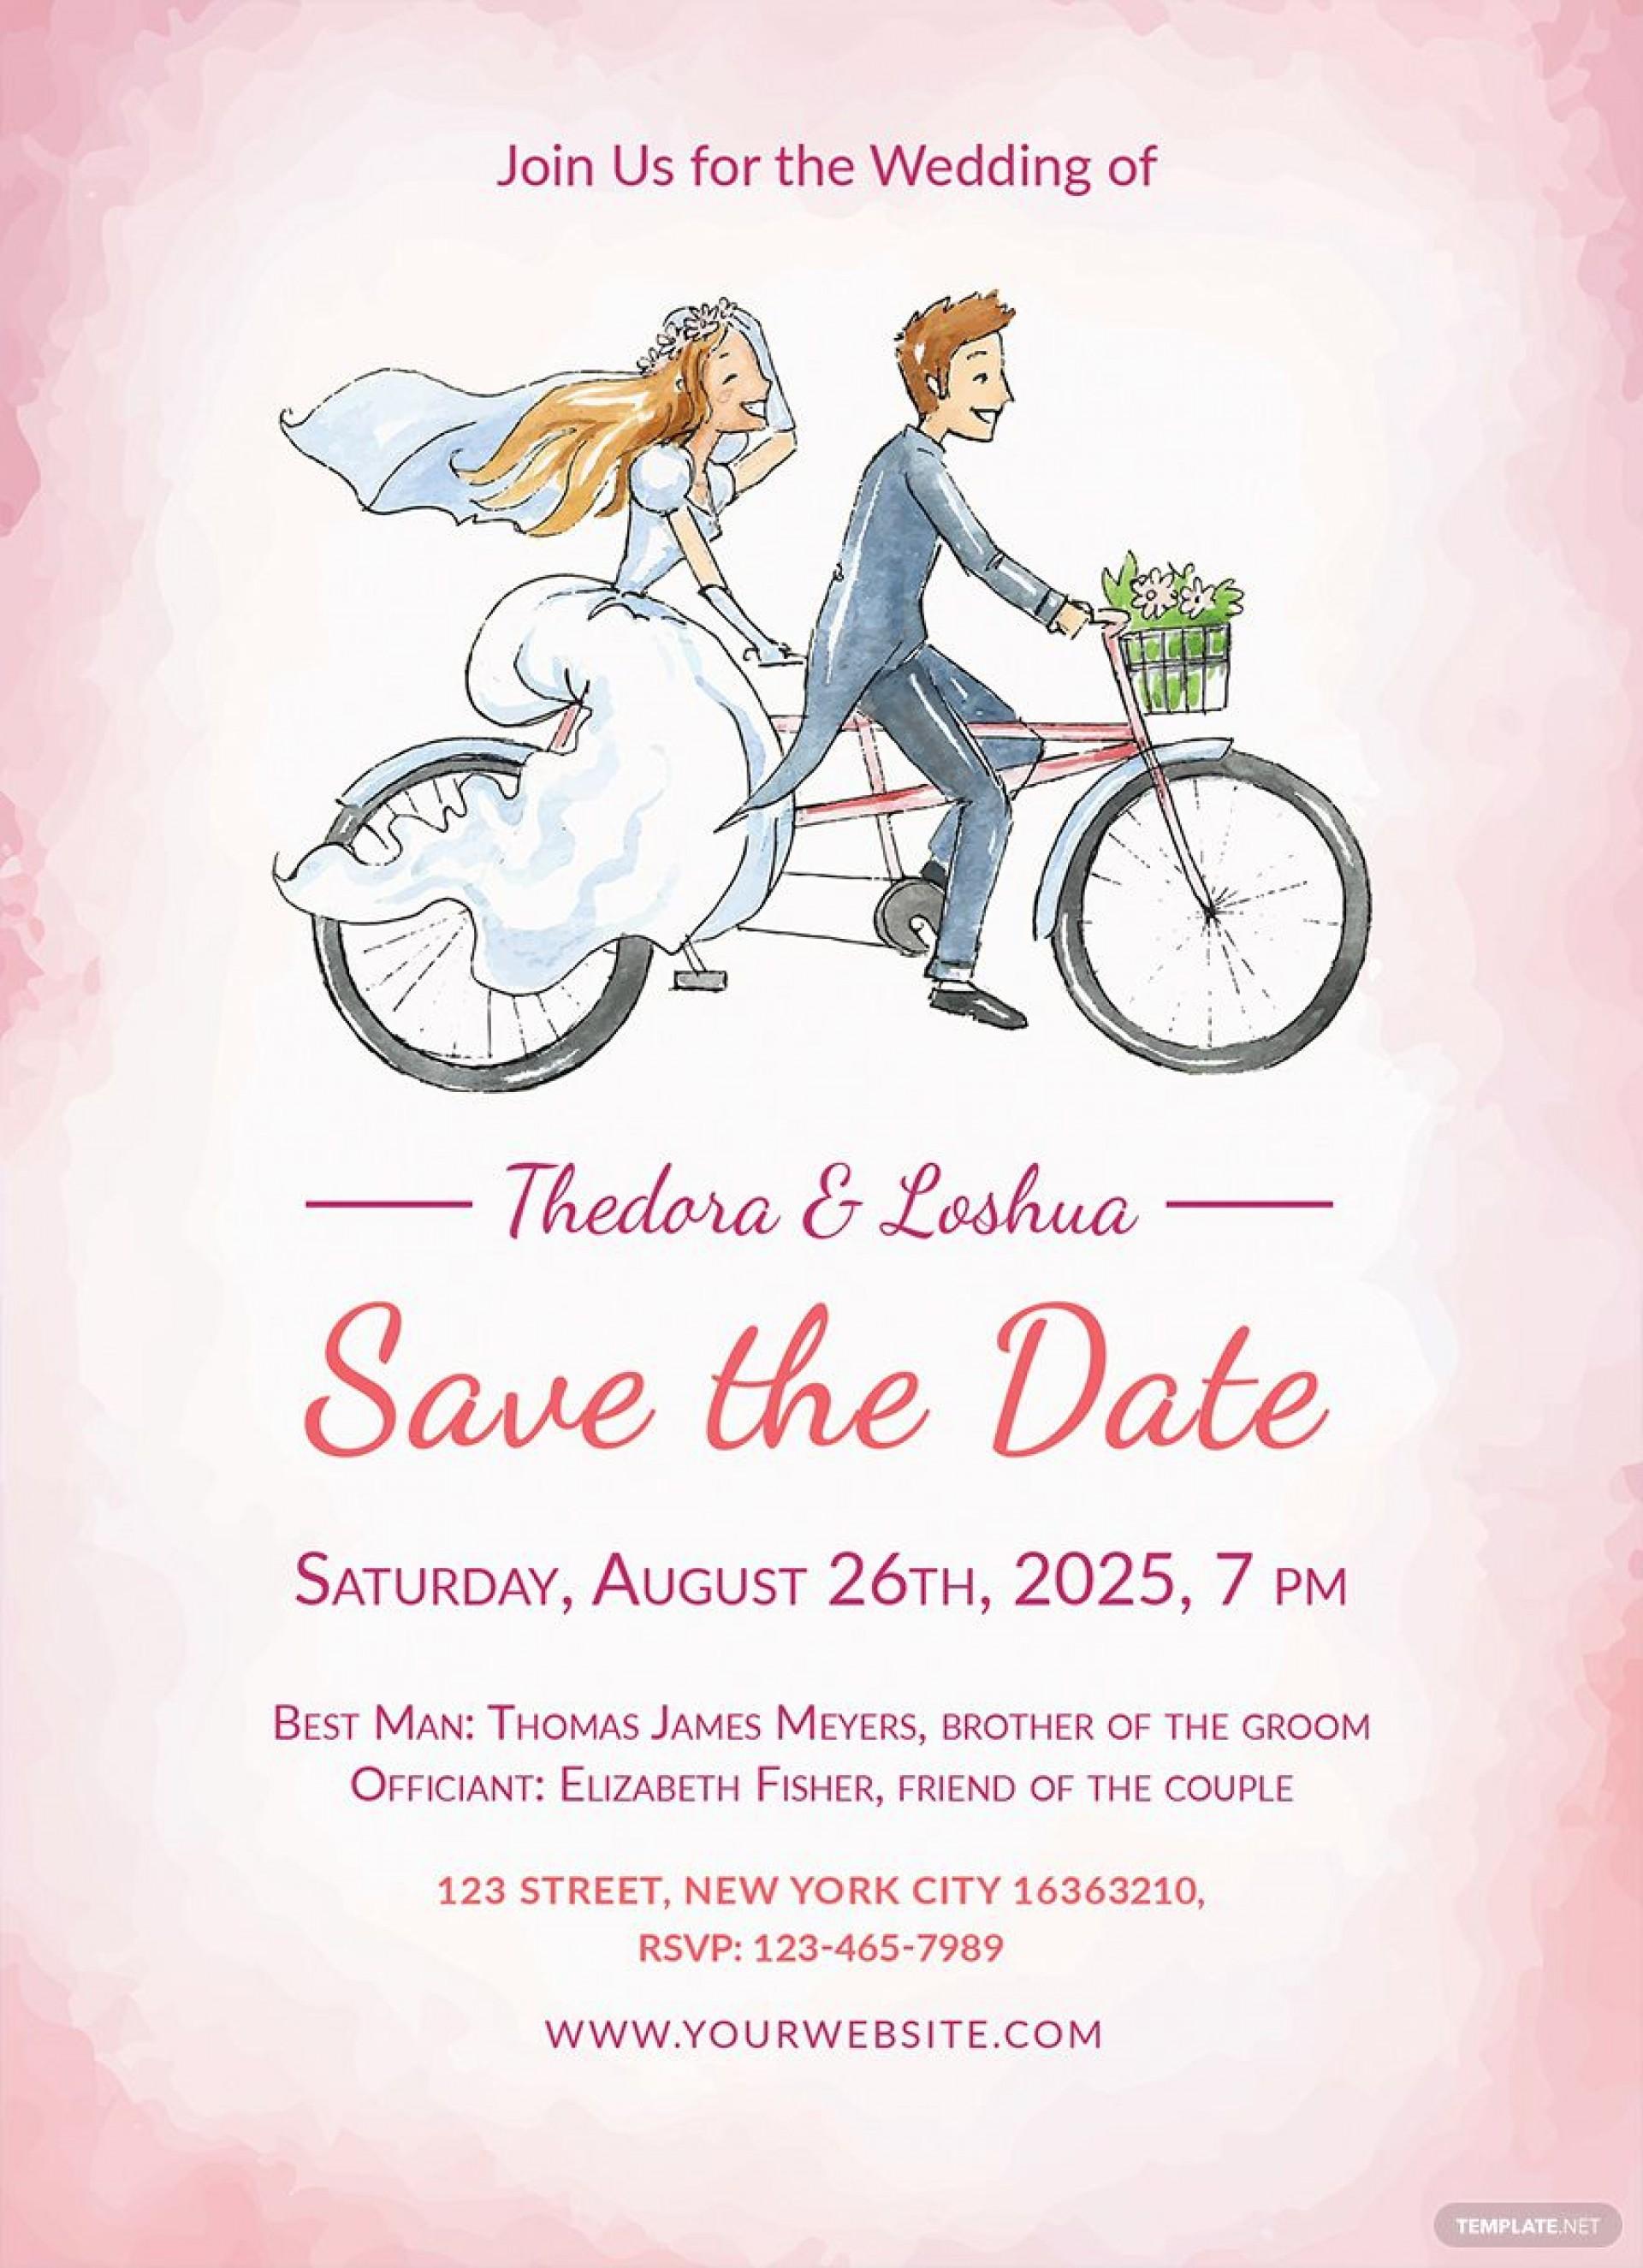 008 Beautiful Sample Wedding Invitation Template Free Download Image  Wording1920